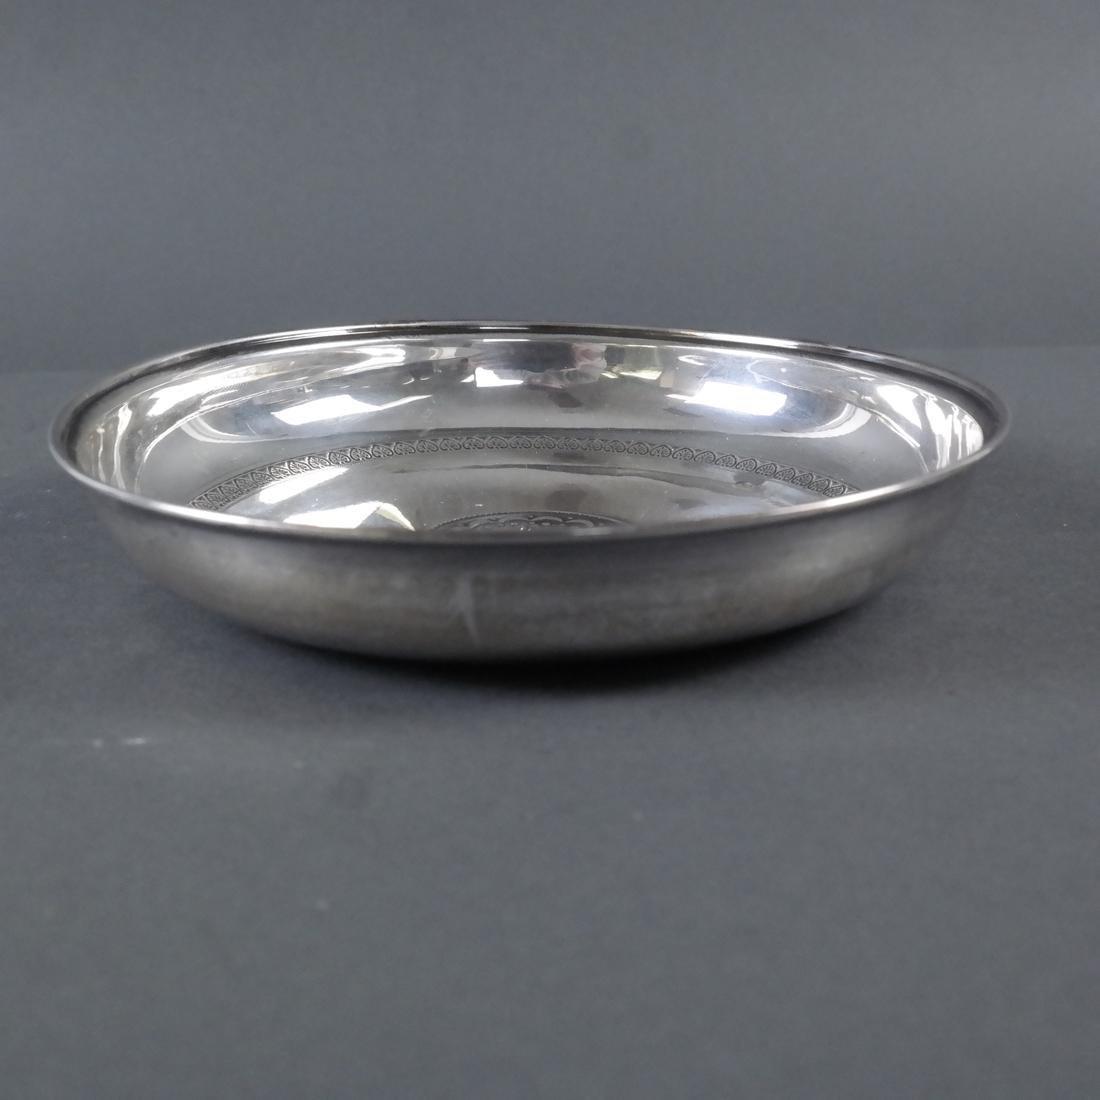 .900 Standard Silver Bowl - 2